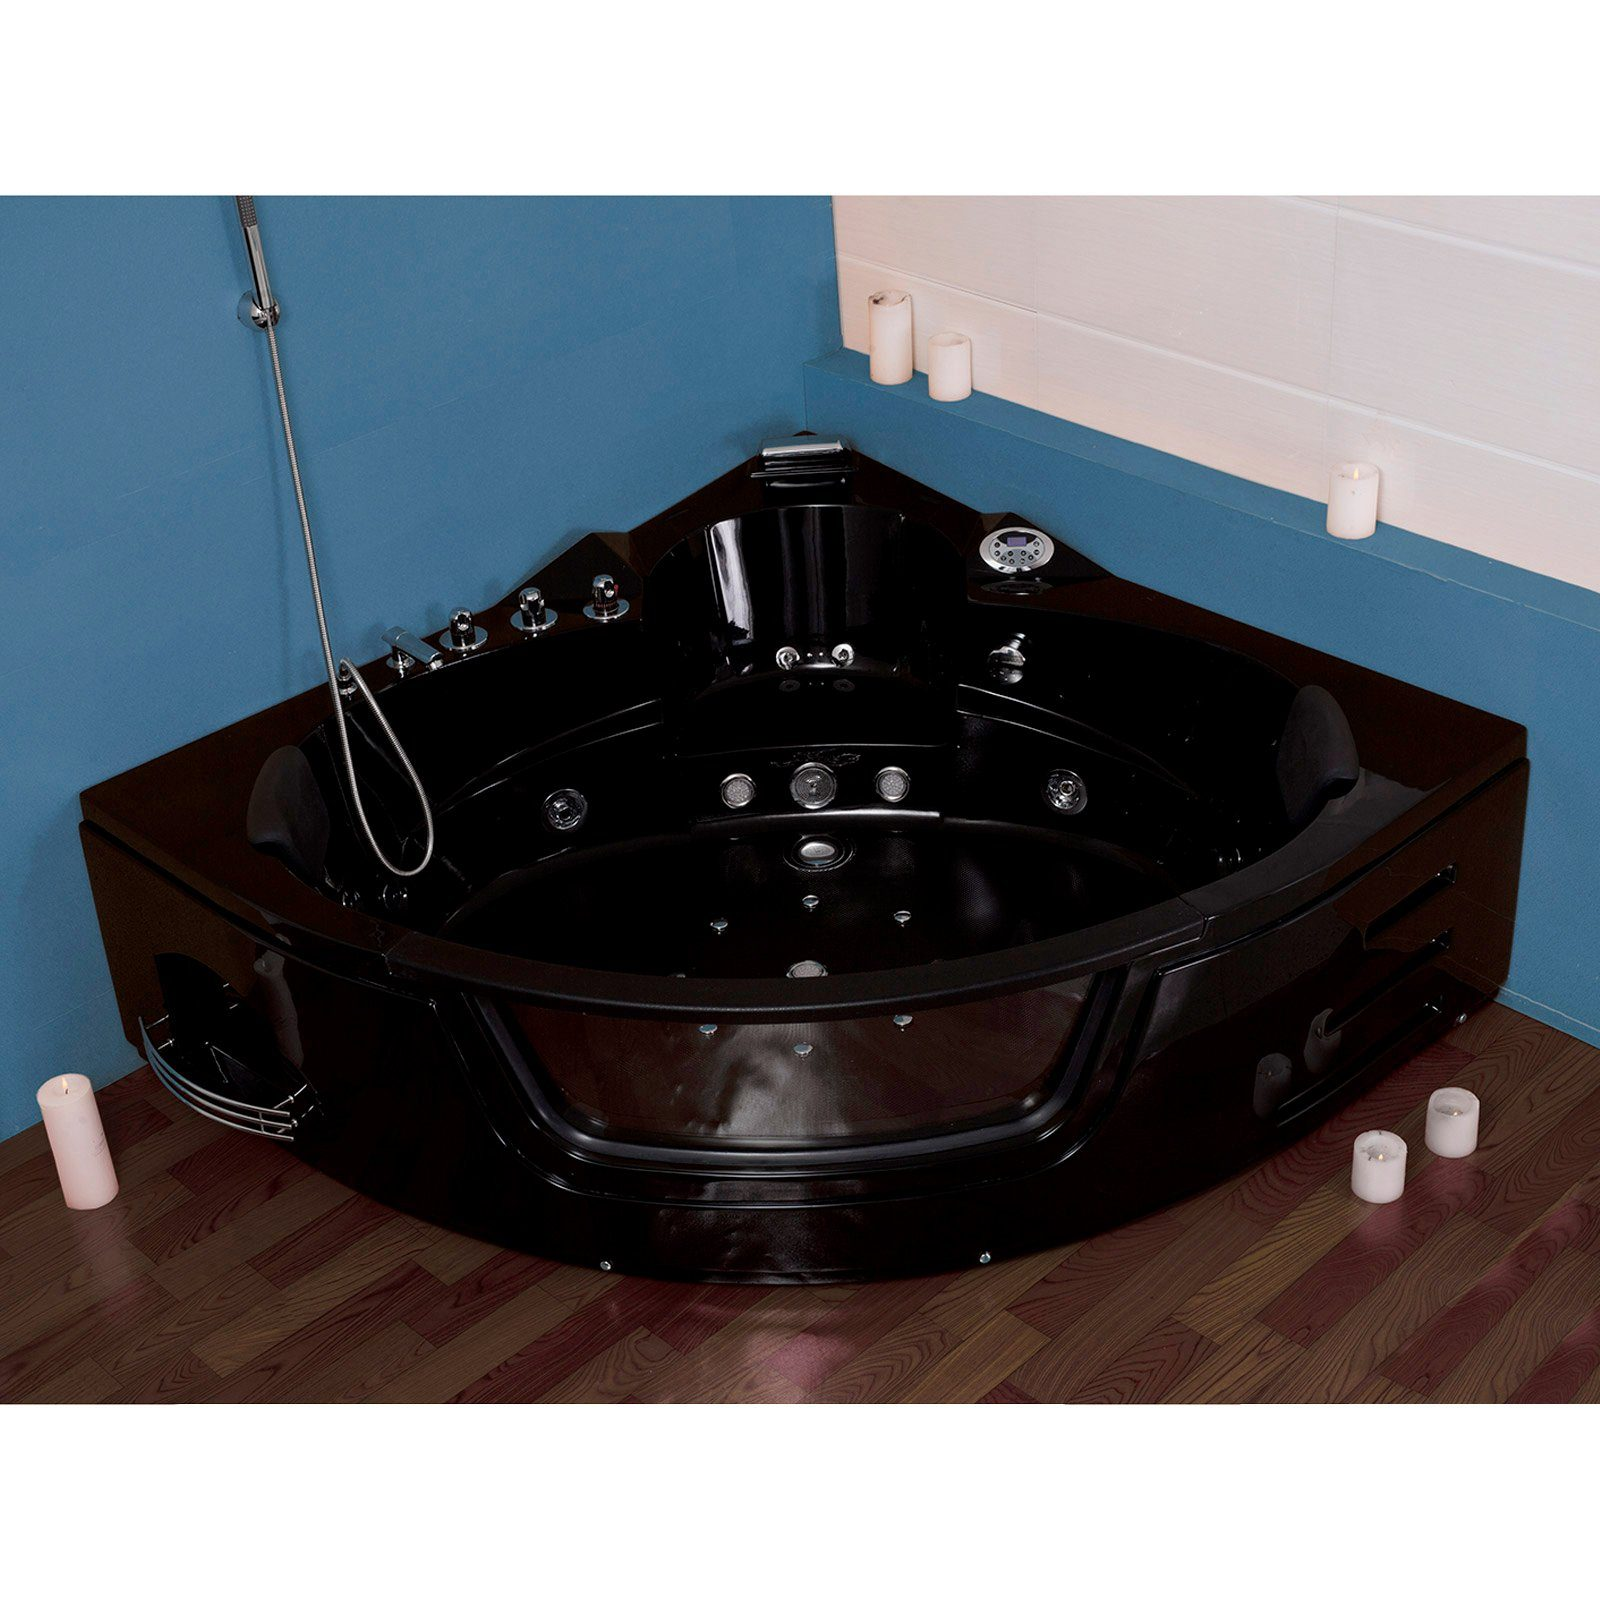 Whirlpool Bad Informatie : Complete set whirlpoolbad vigo l« bxdxh in cm